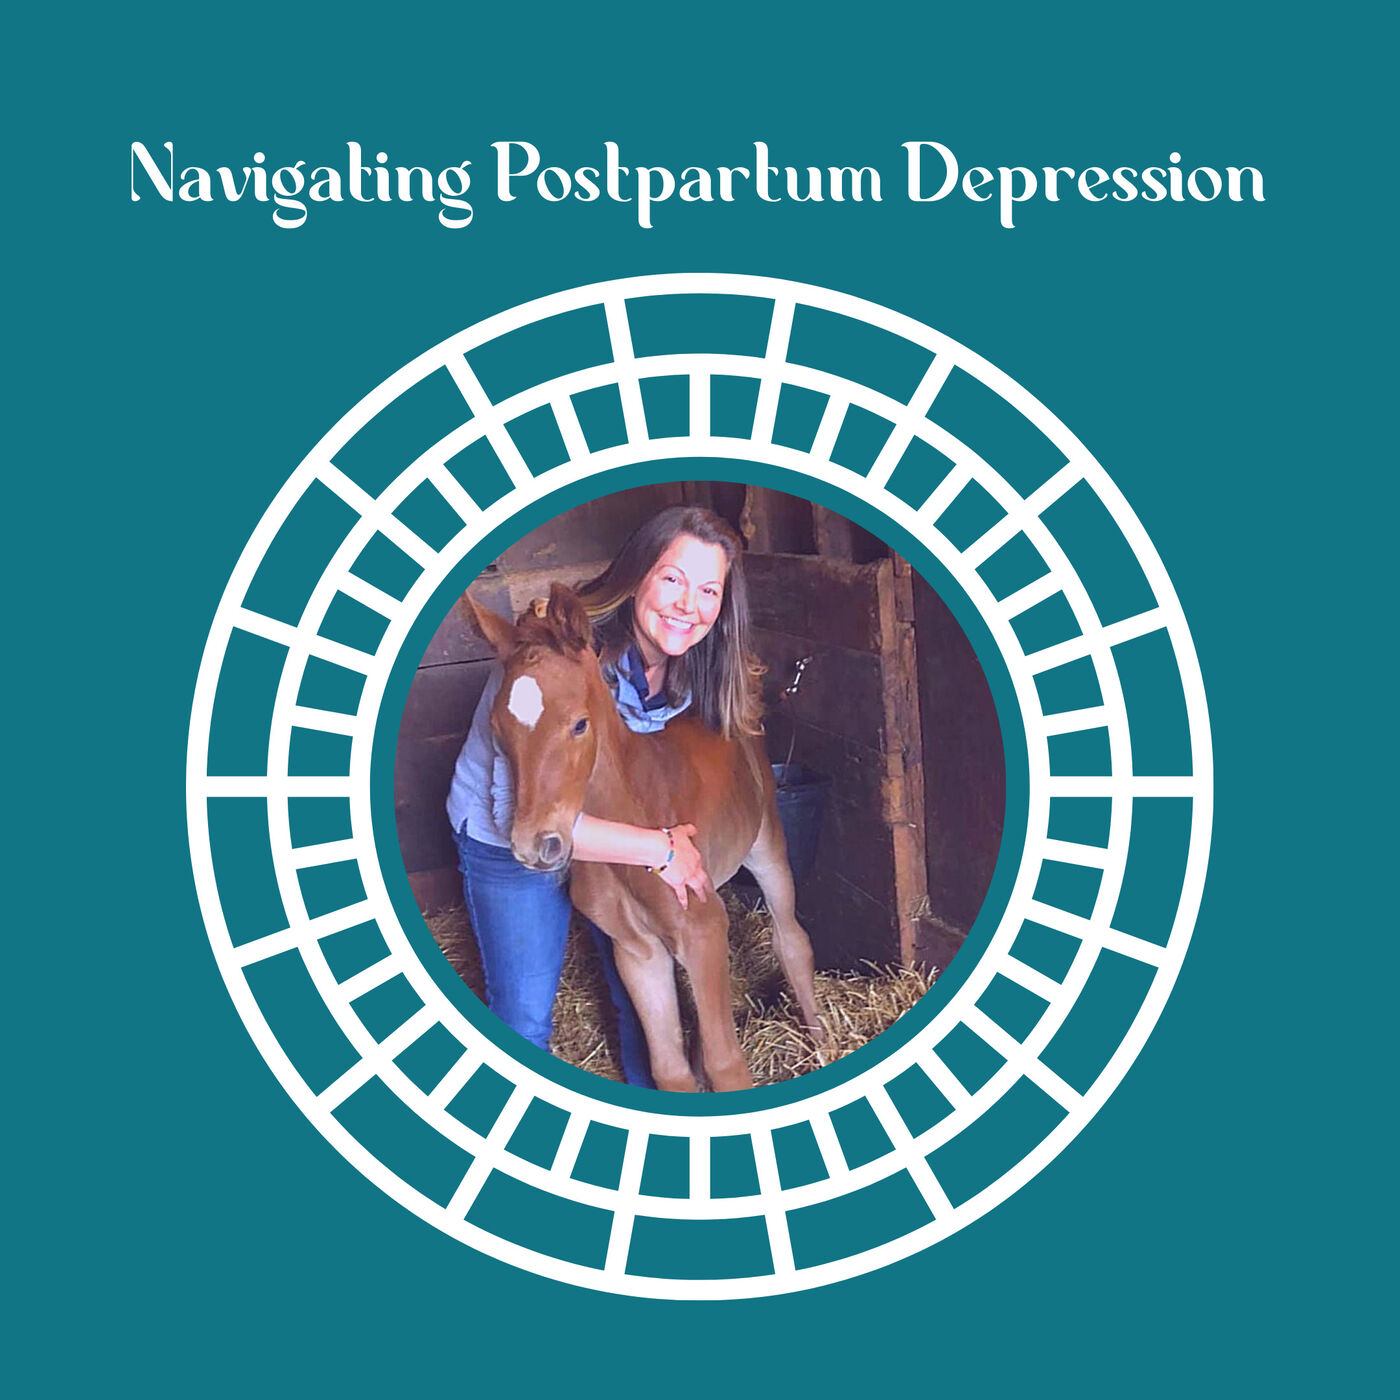 Navigating Postpartum Depression with Dr. Misty Gray